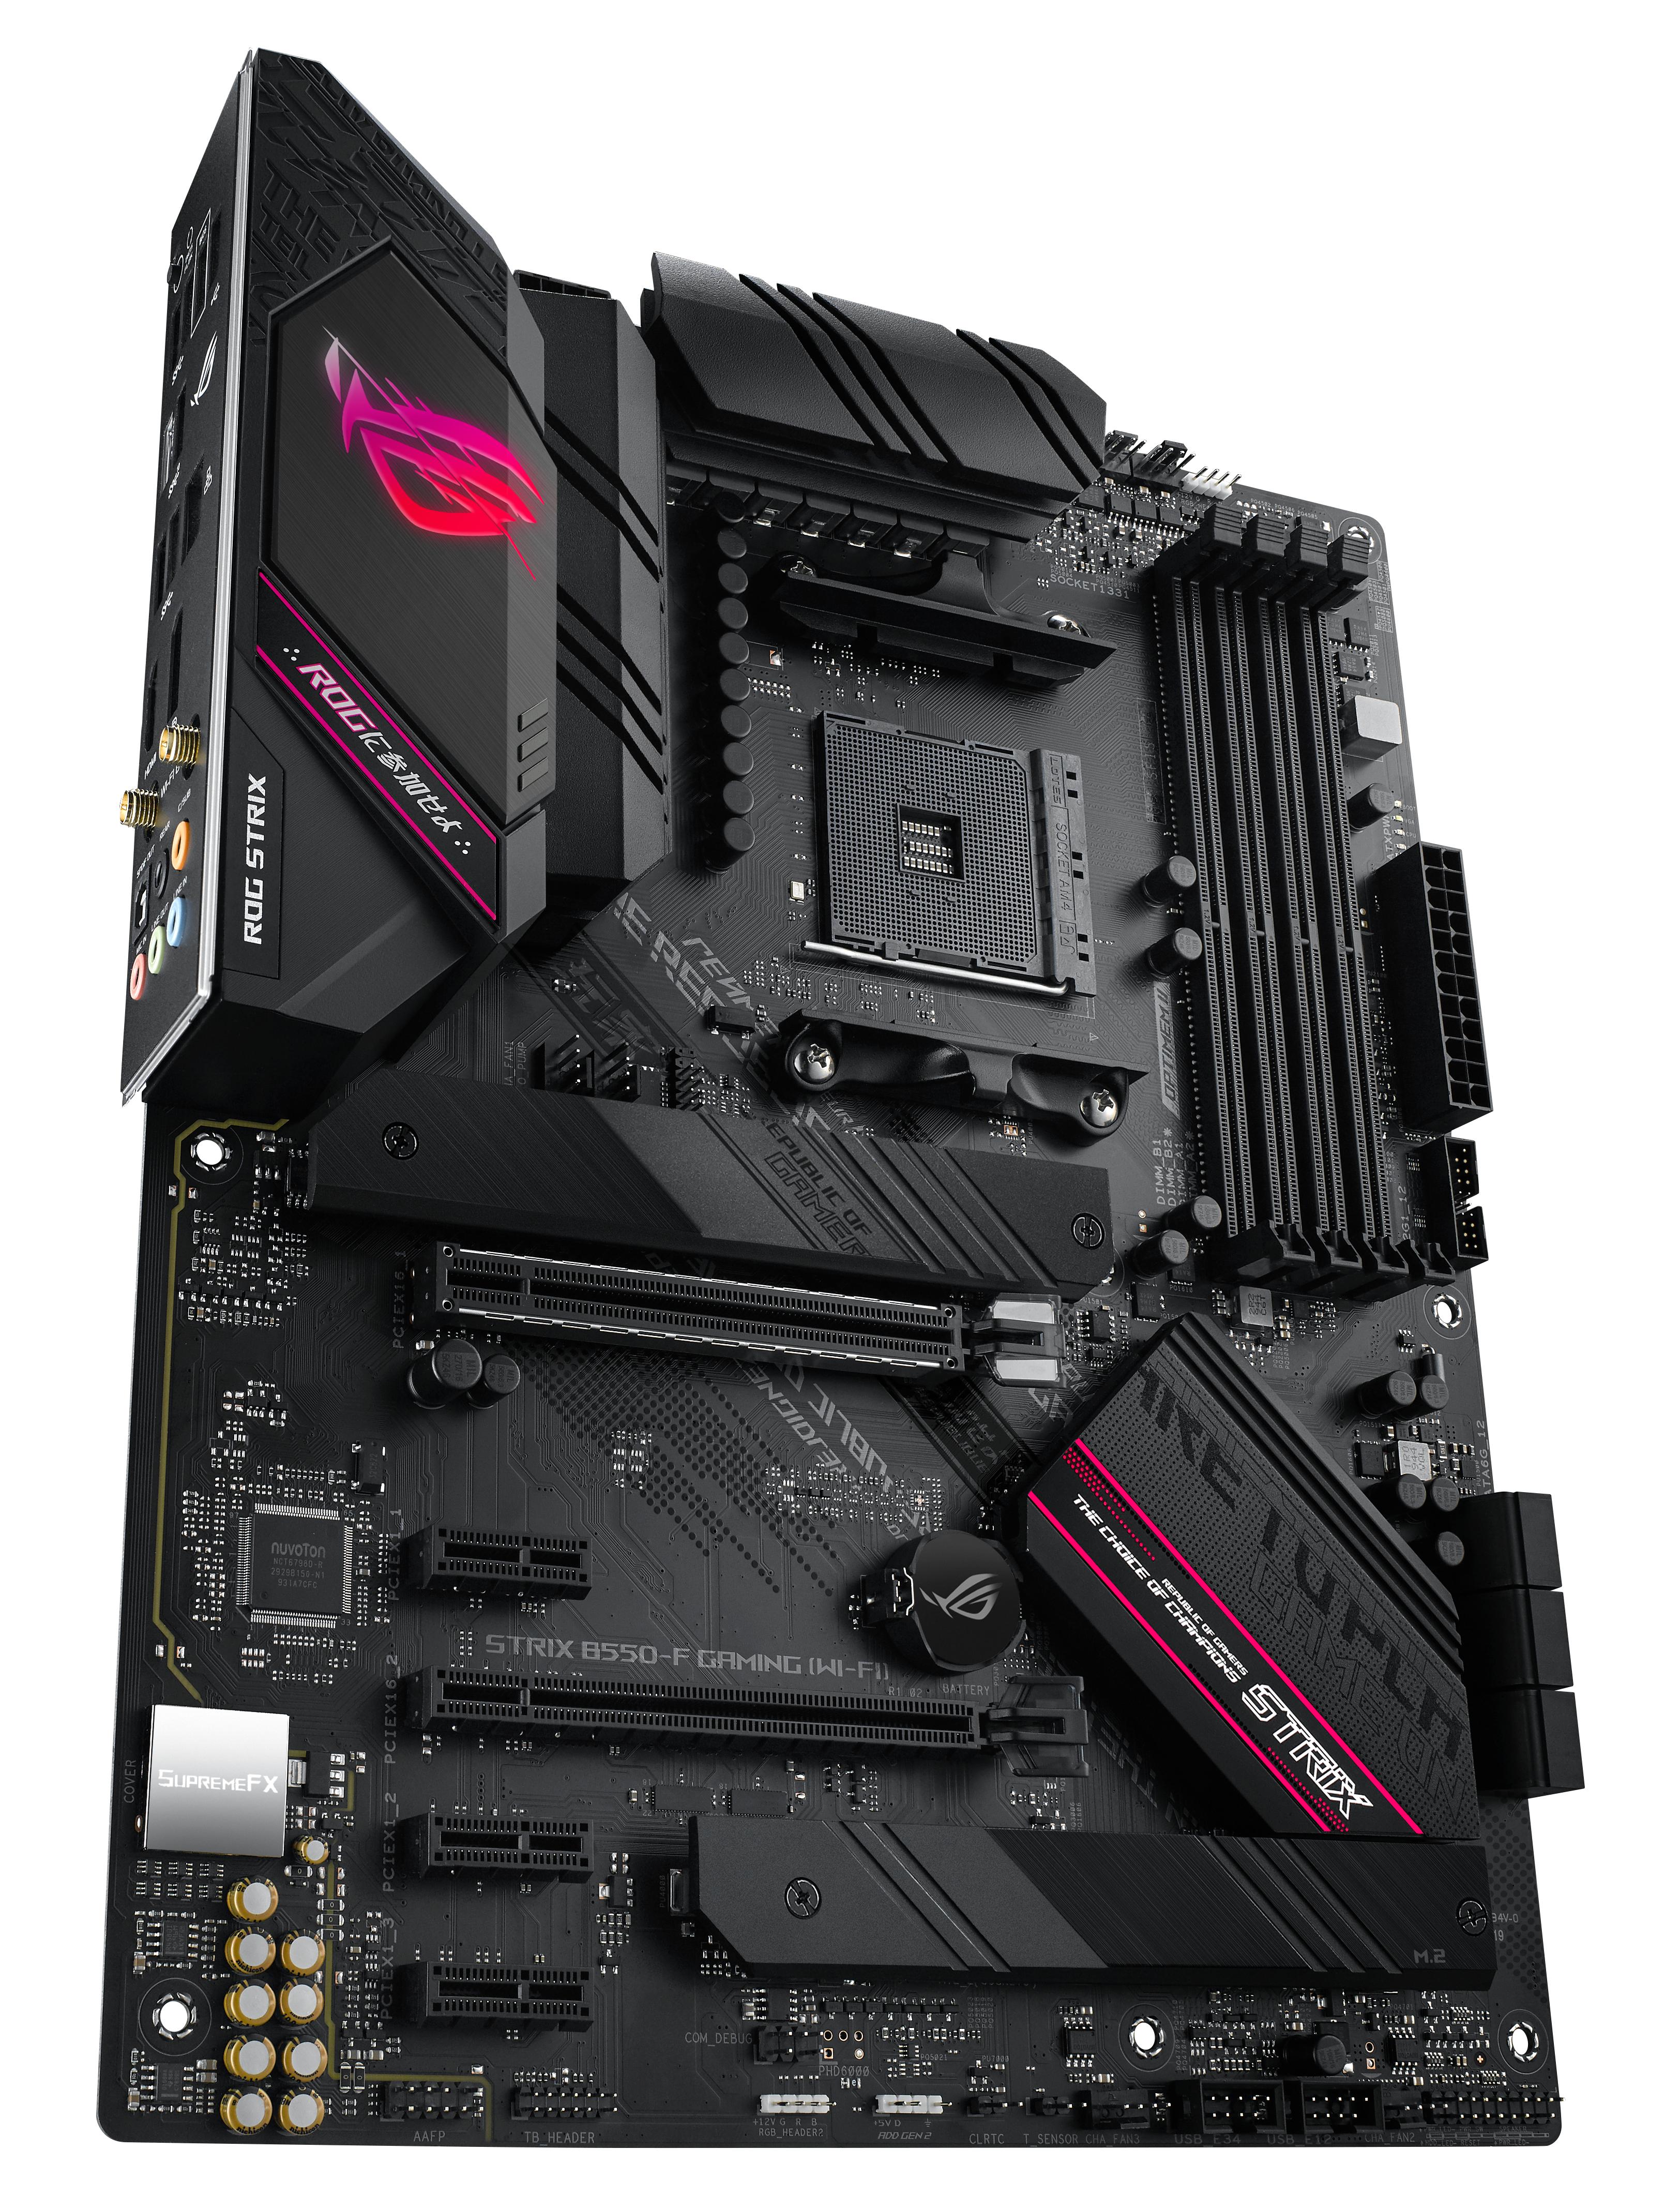 ASUS ROG Strix B550-F Gaming B550 - Mainboard - AMD Sockel AM4 (Ryzen)